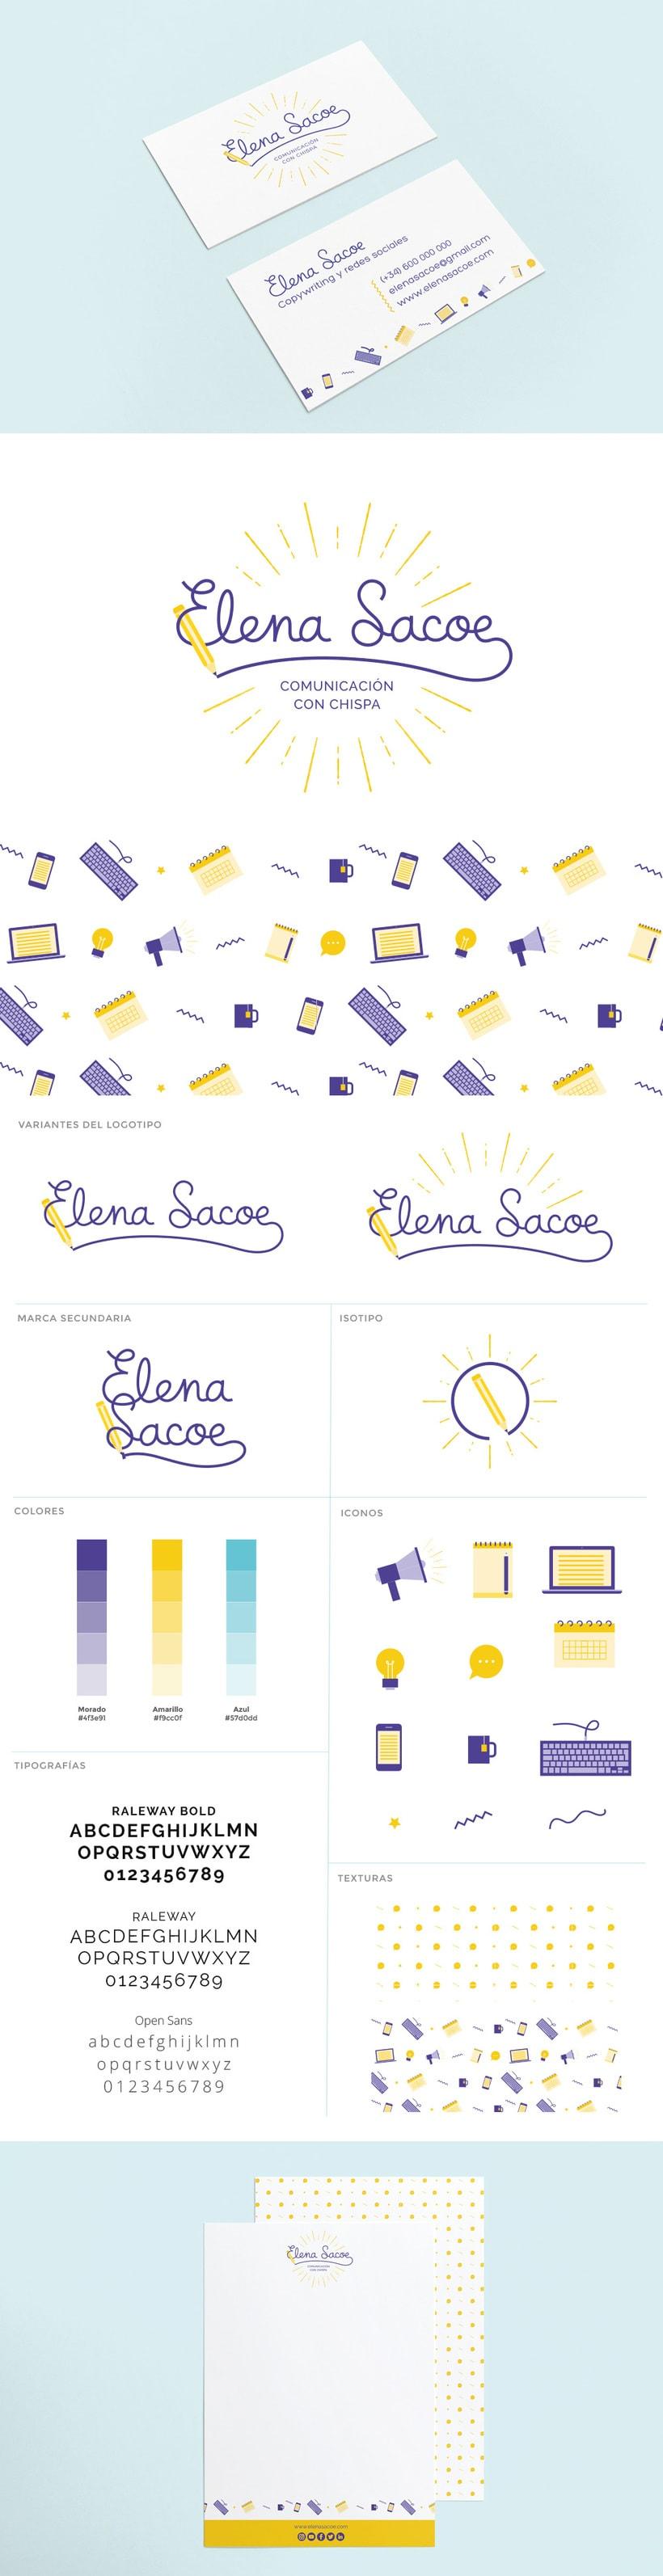 Branding Elena Sacoe -1